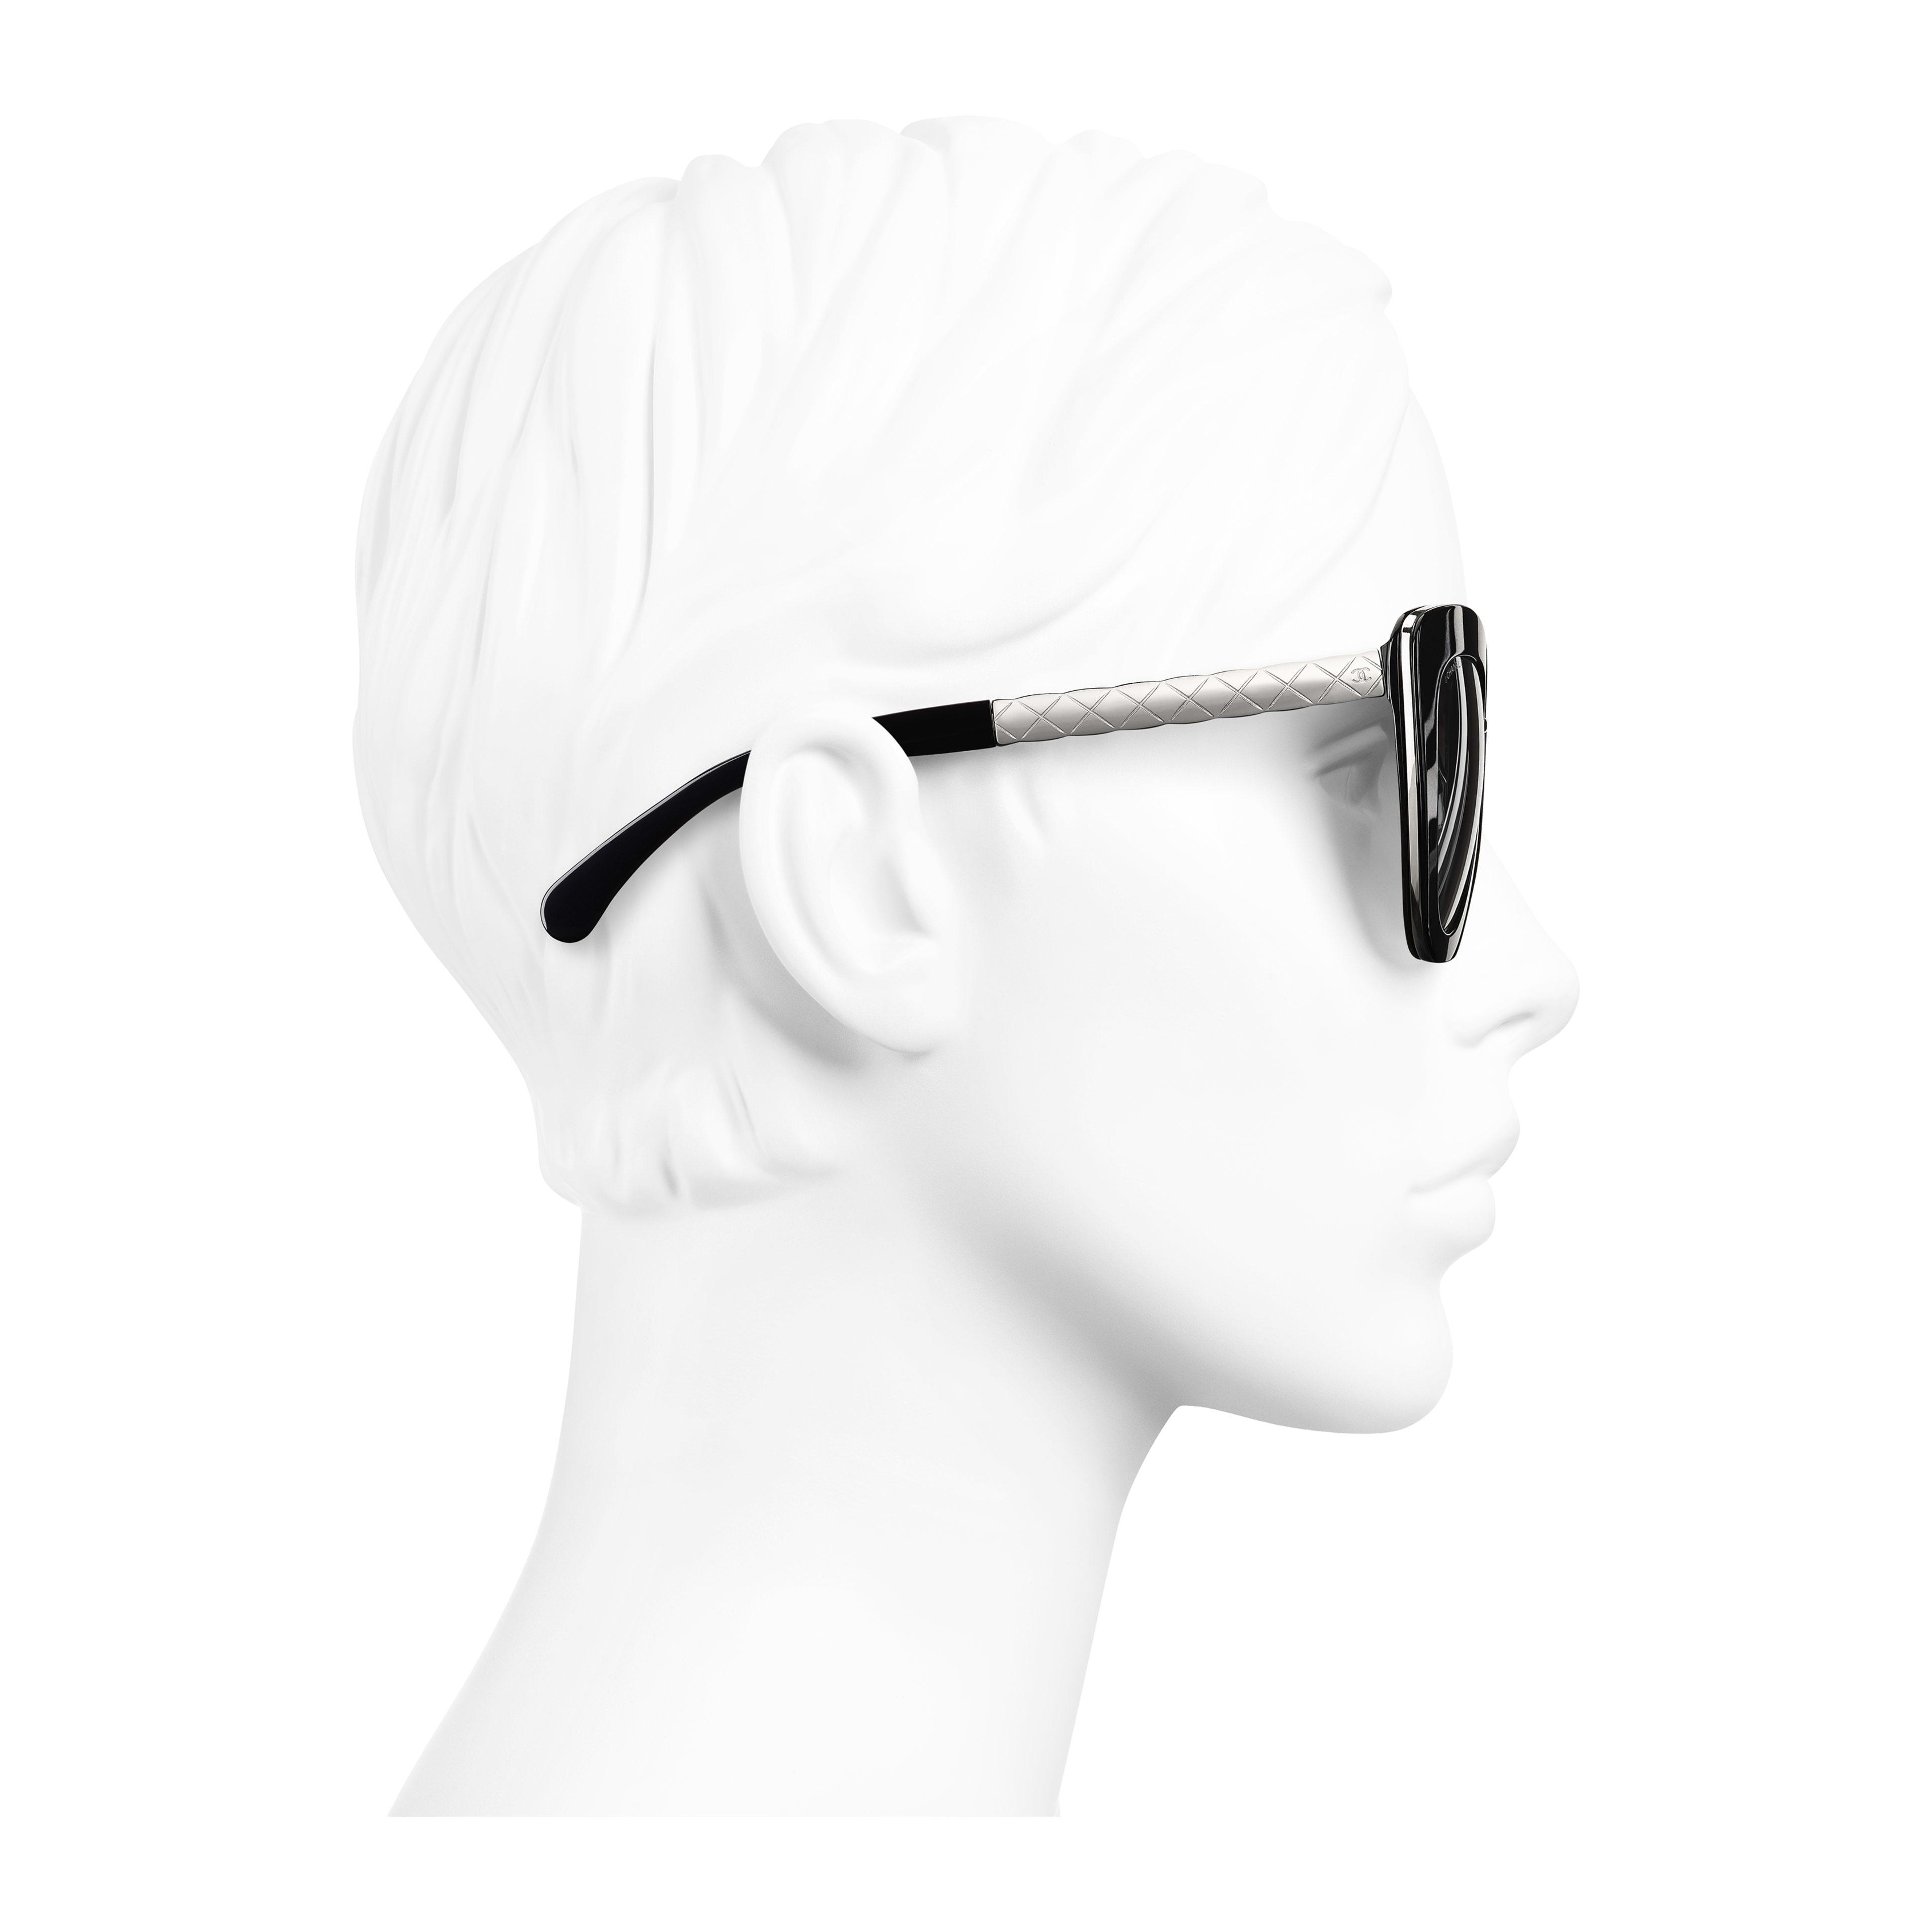 Cat Eye Sunglasses Acetate & Metal Black - - see full sized version